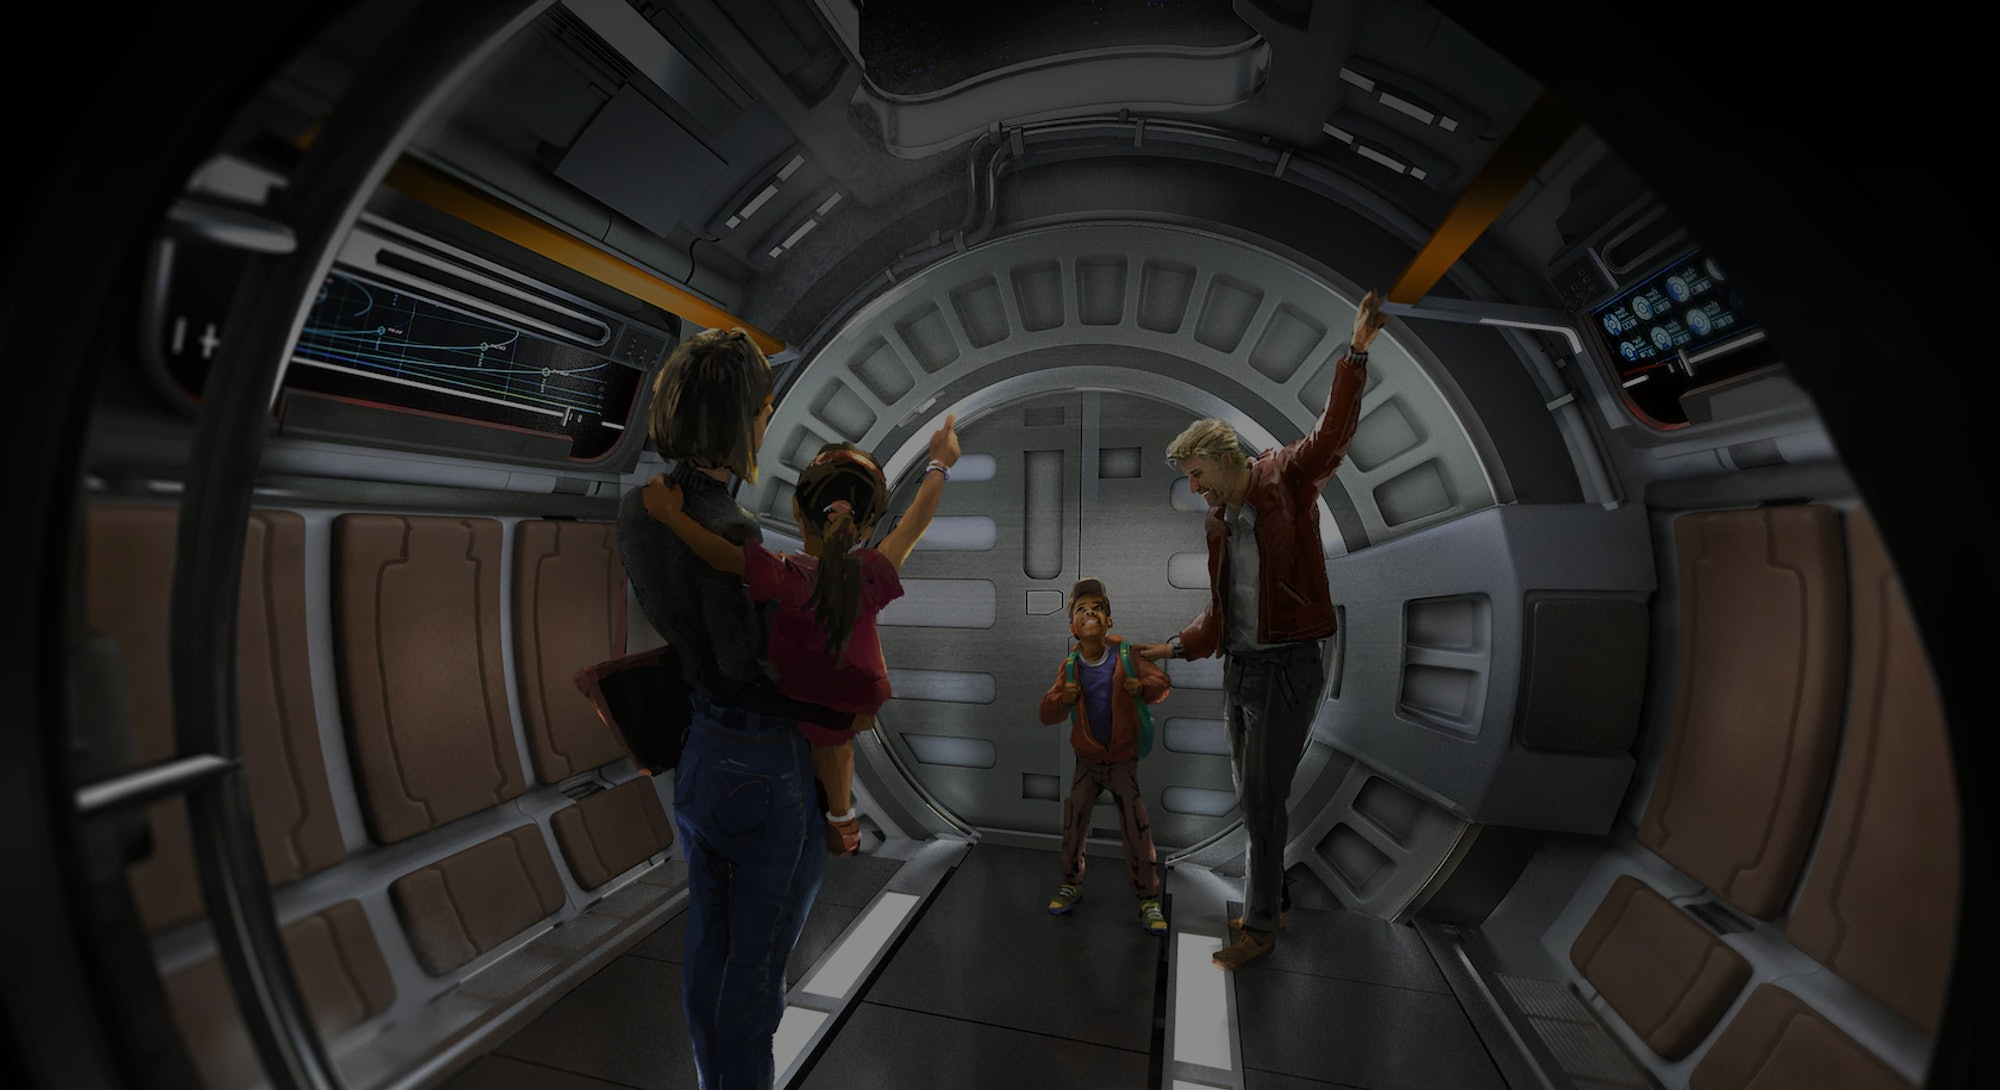 concept art of spaceship hallway from Star Wars: Galactic Starcruiser